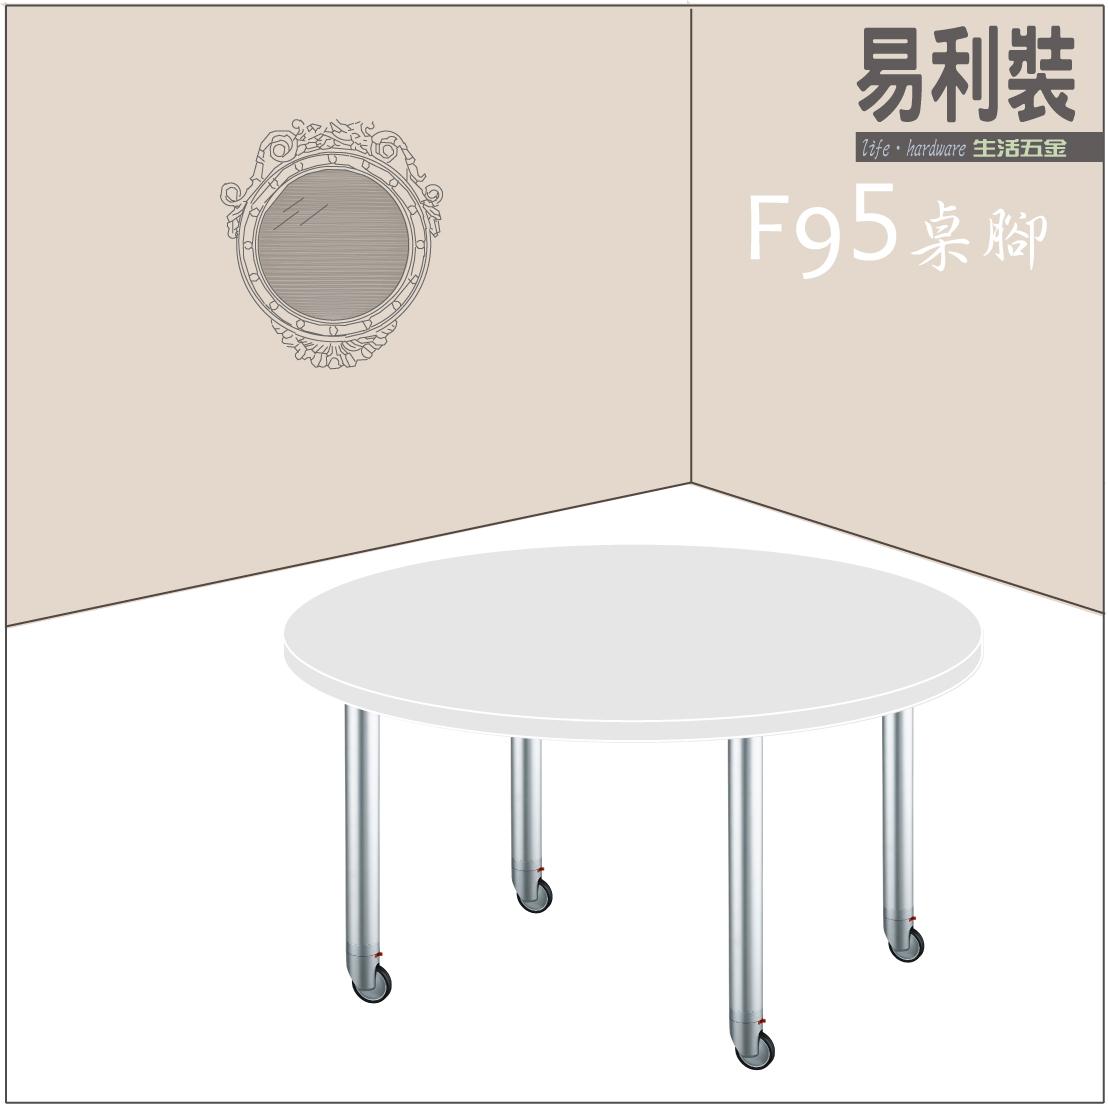 【 EASYCAN  】F95 餐桌腳 易利裝生活五金 書桌腳 玩具桌腳 工作桌腳 房間 臥房 衣櫃 小資族 辦公家具 系統家具